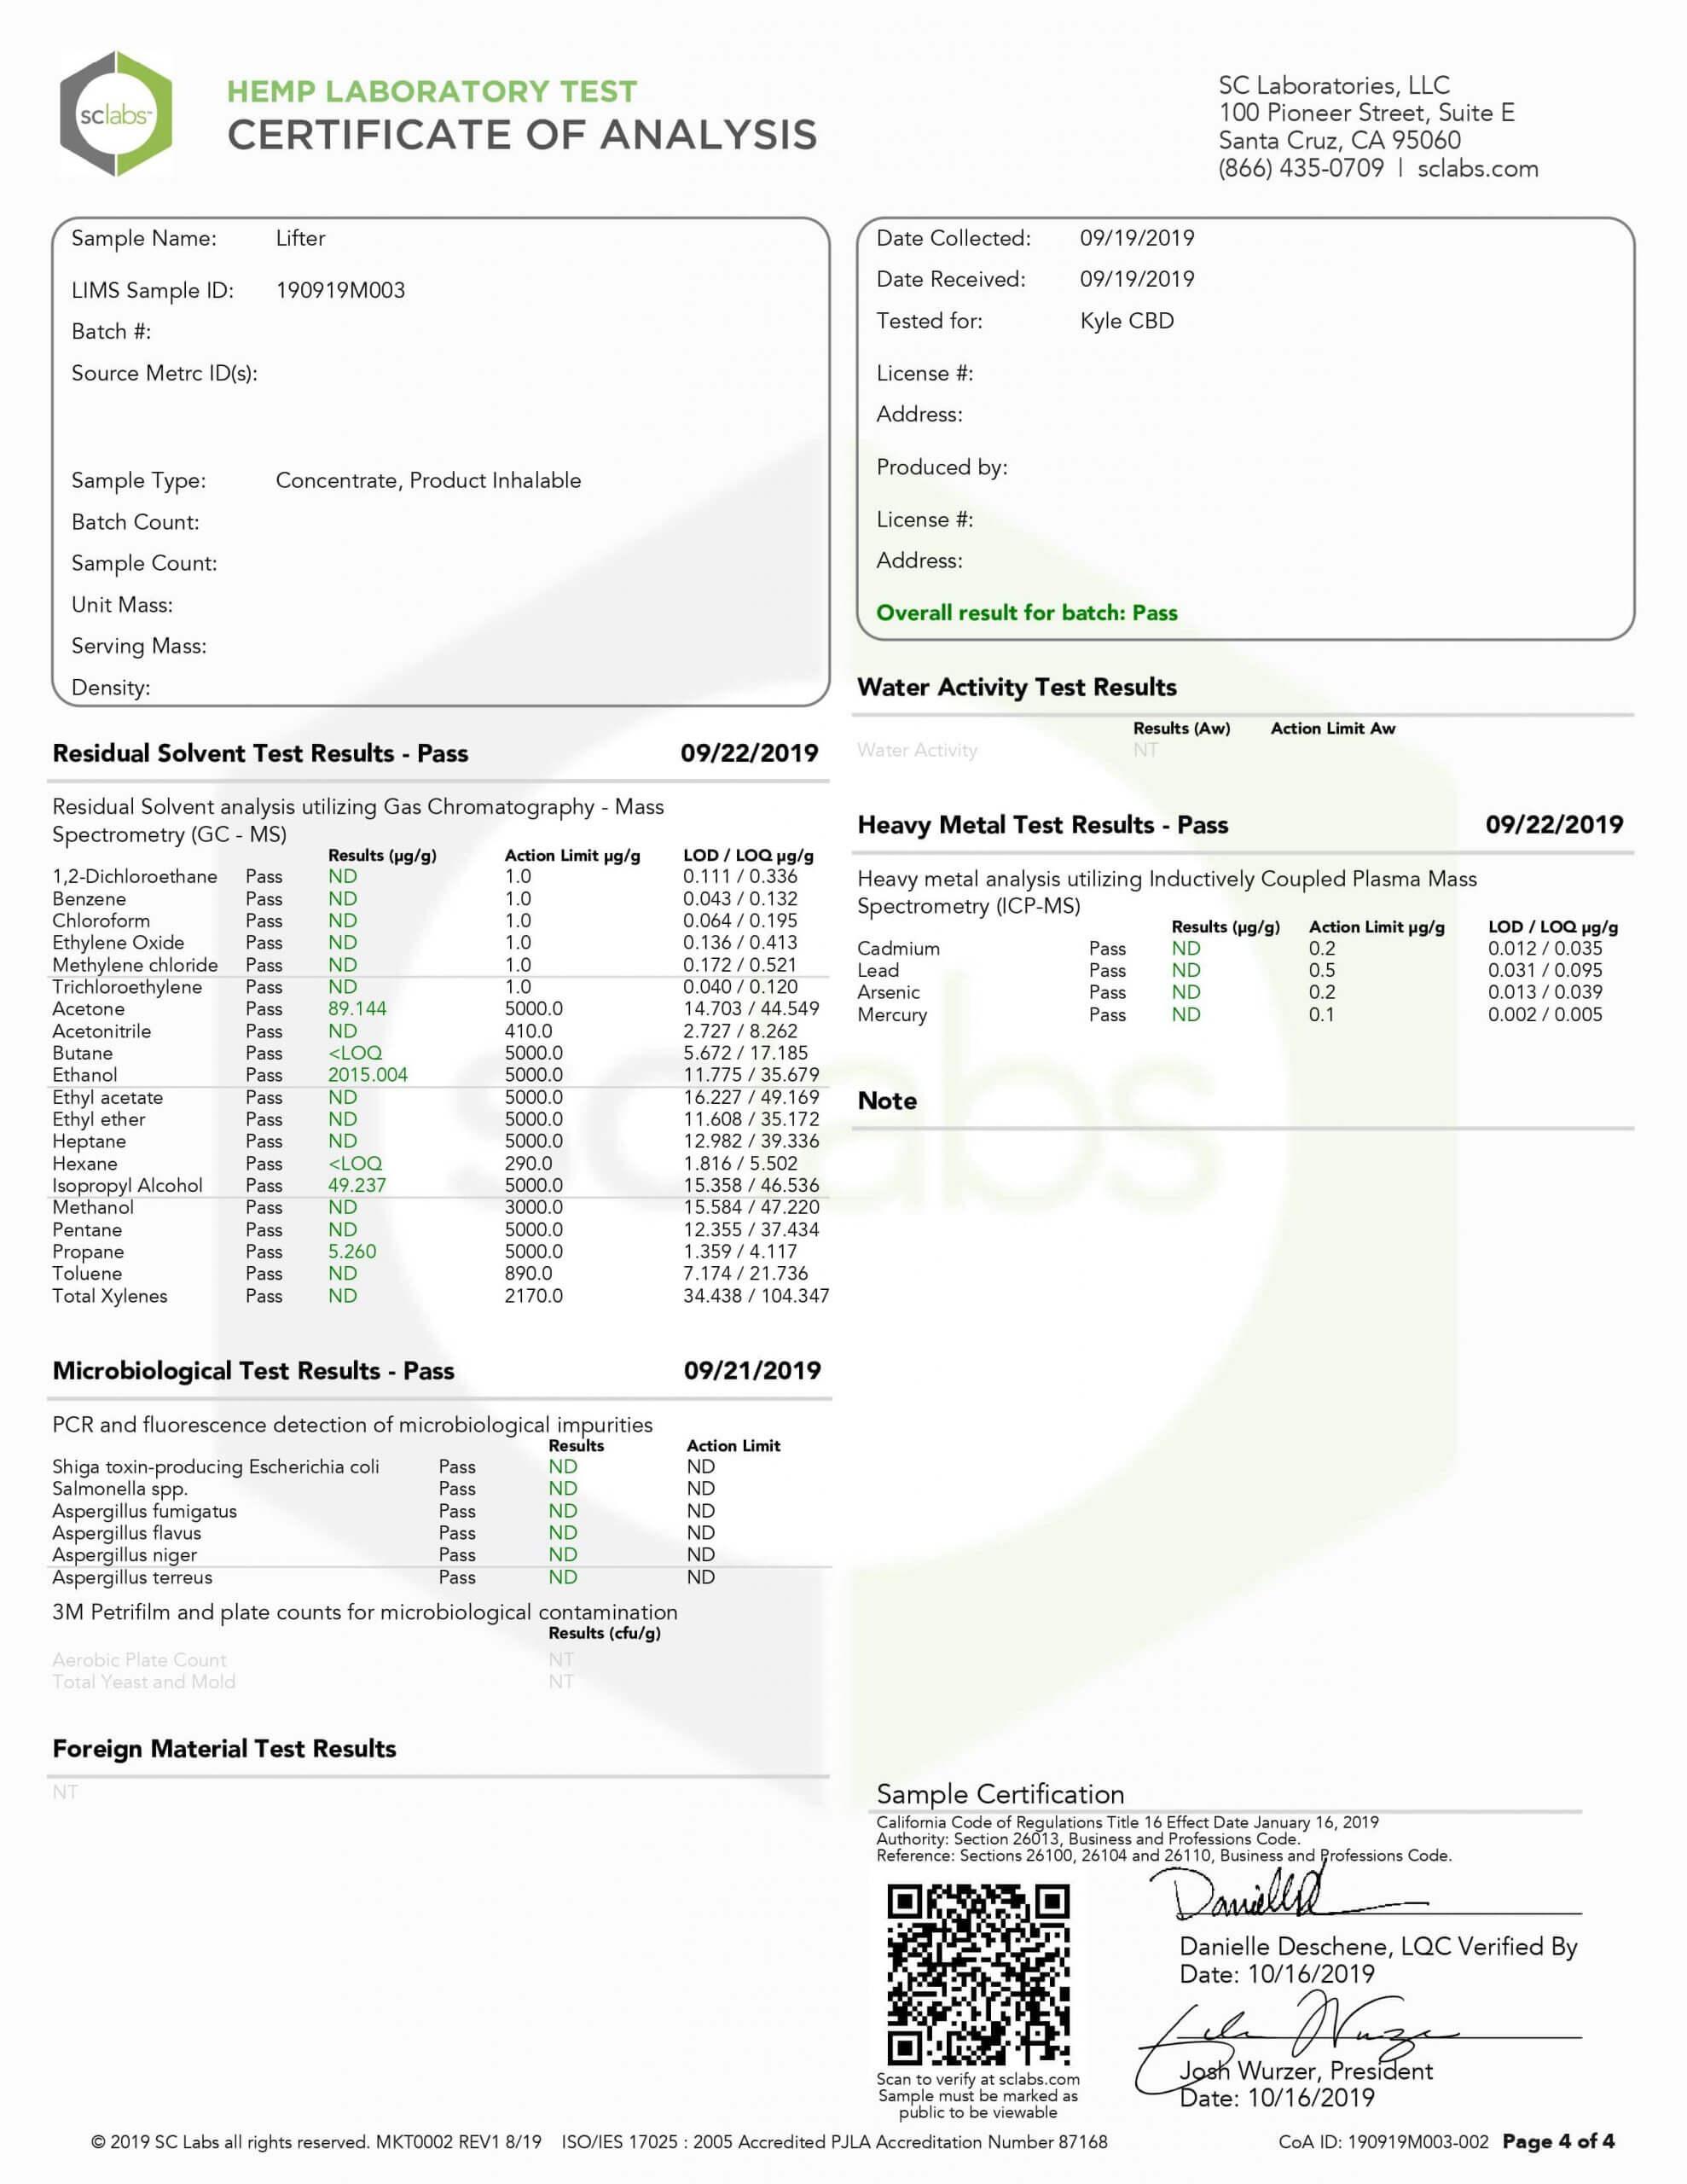 KYLE CBD Pods Lifter Hemp Lab Report